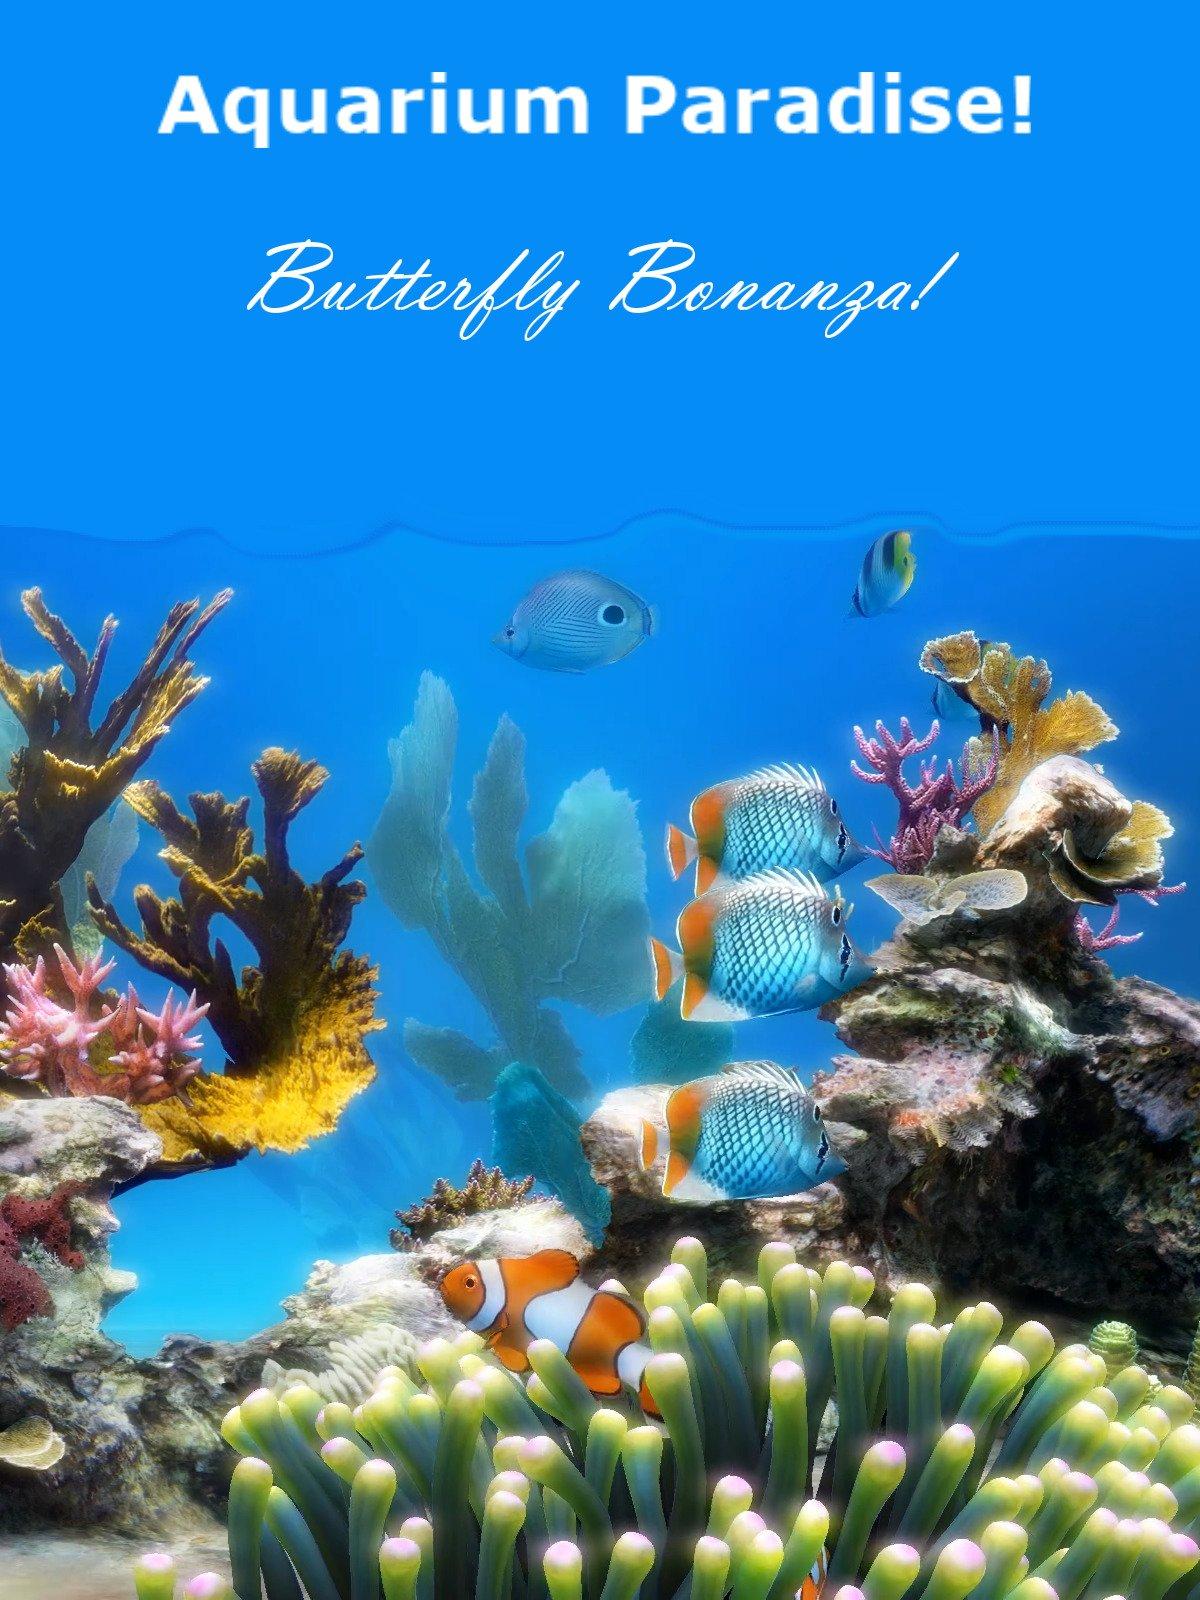 Aquarium Paradise: Butterfly Bonanza